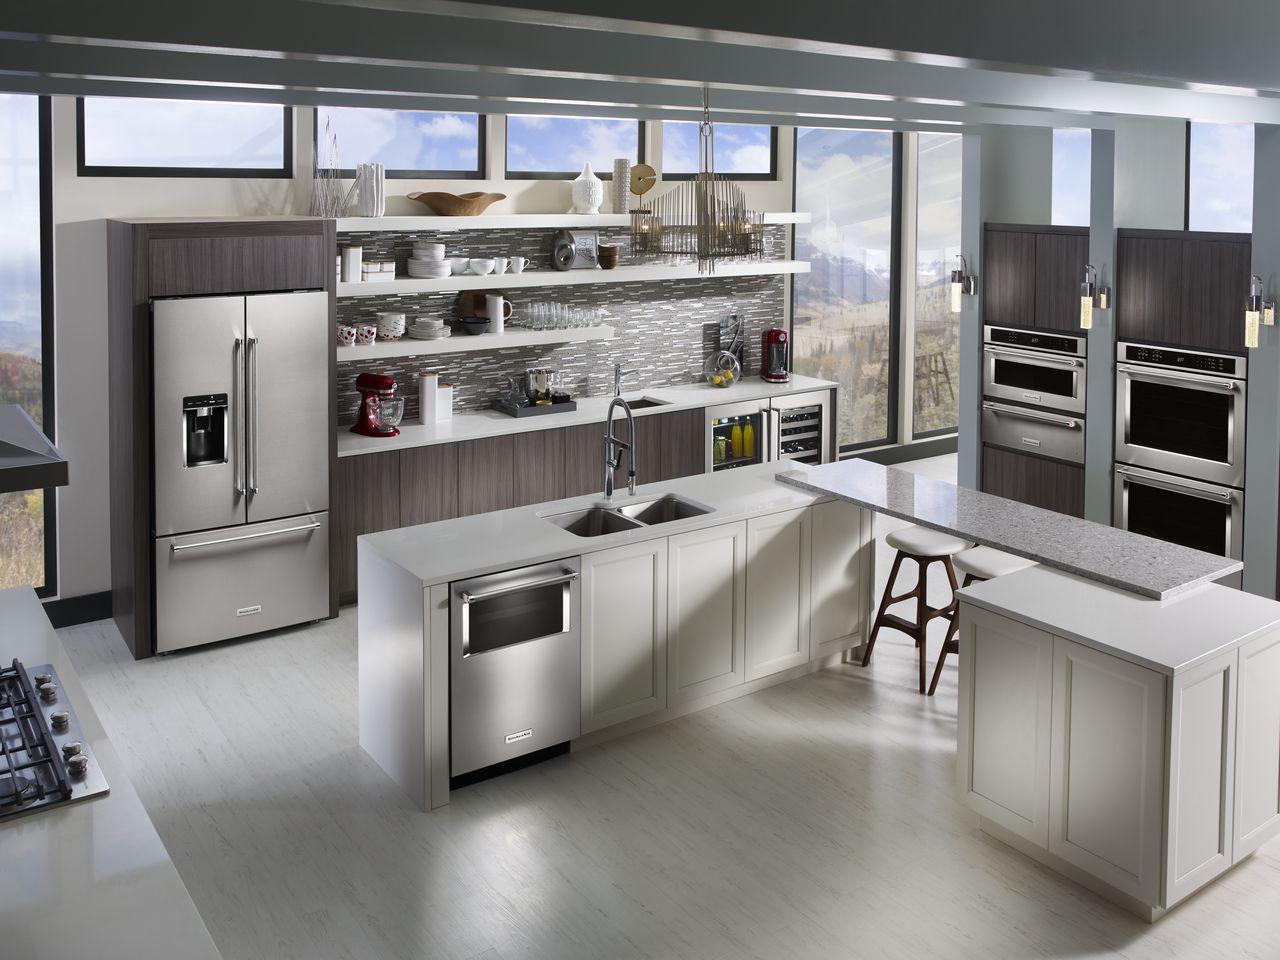 KitchenAid Introduces Three-Door Free Standing Refrigerator